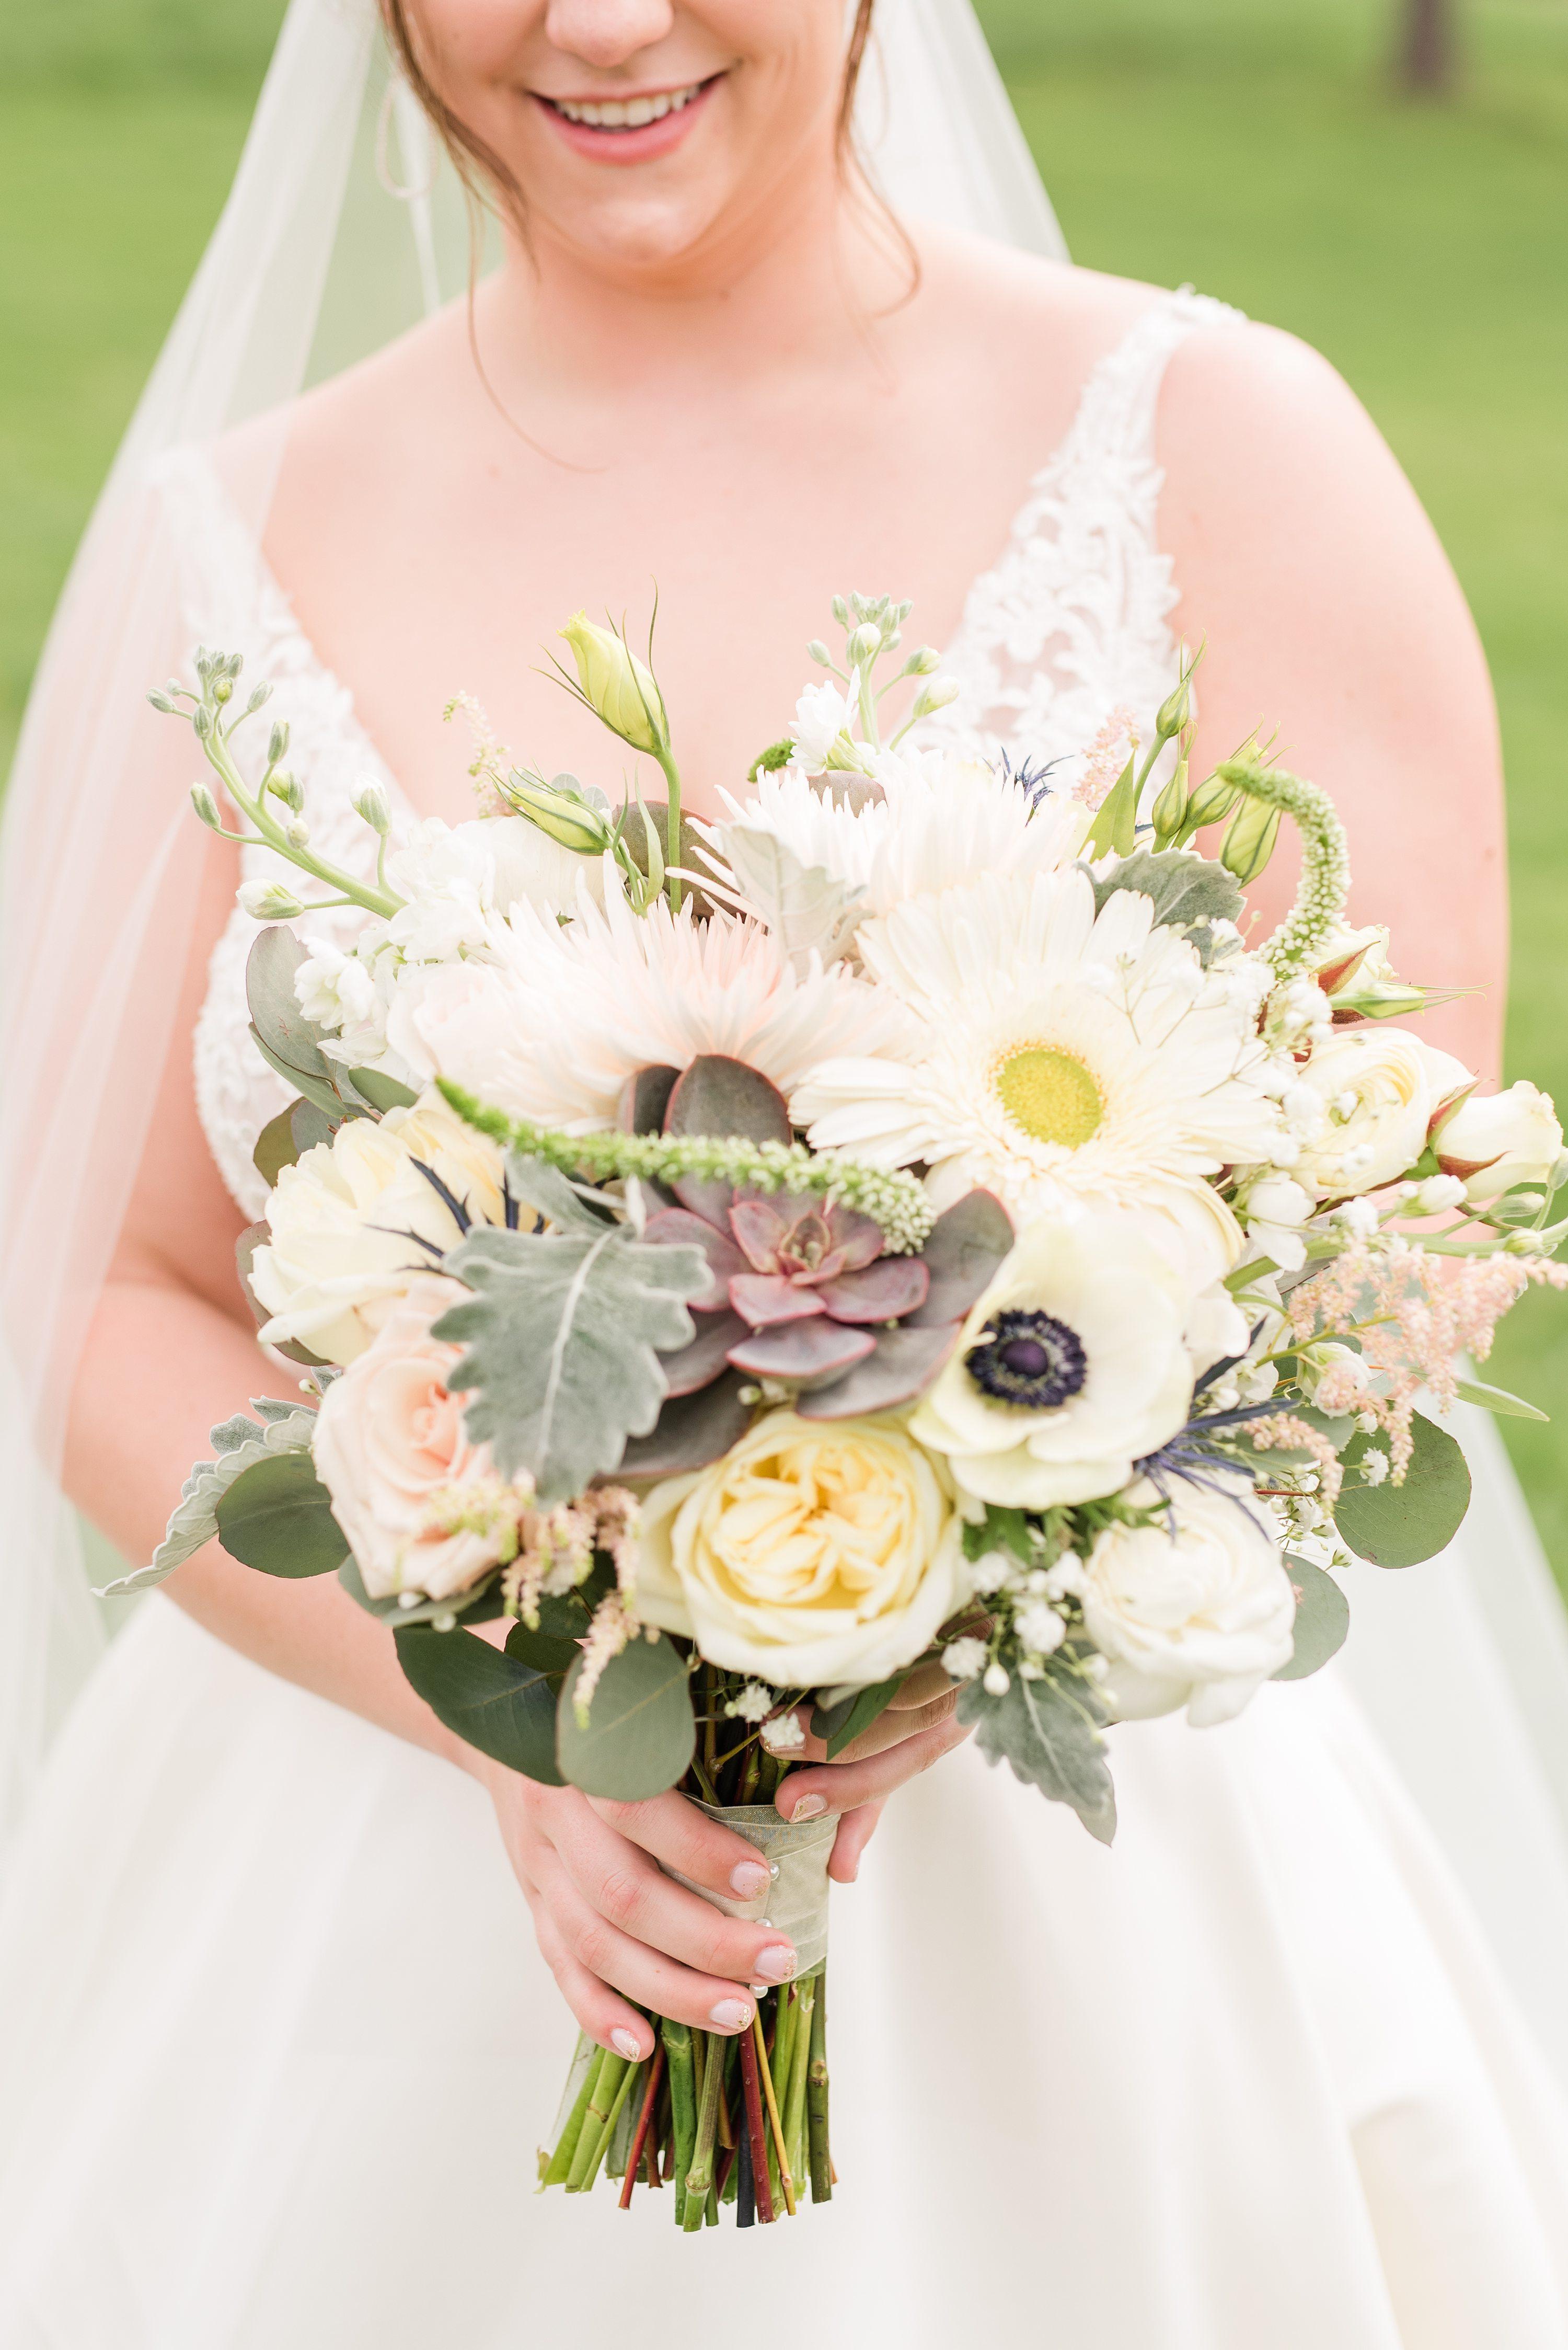 Blue Ridge Mountains,Southern Wedding,bridal bouquet,bride,Bride in dress